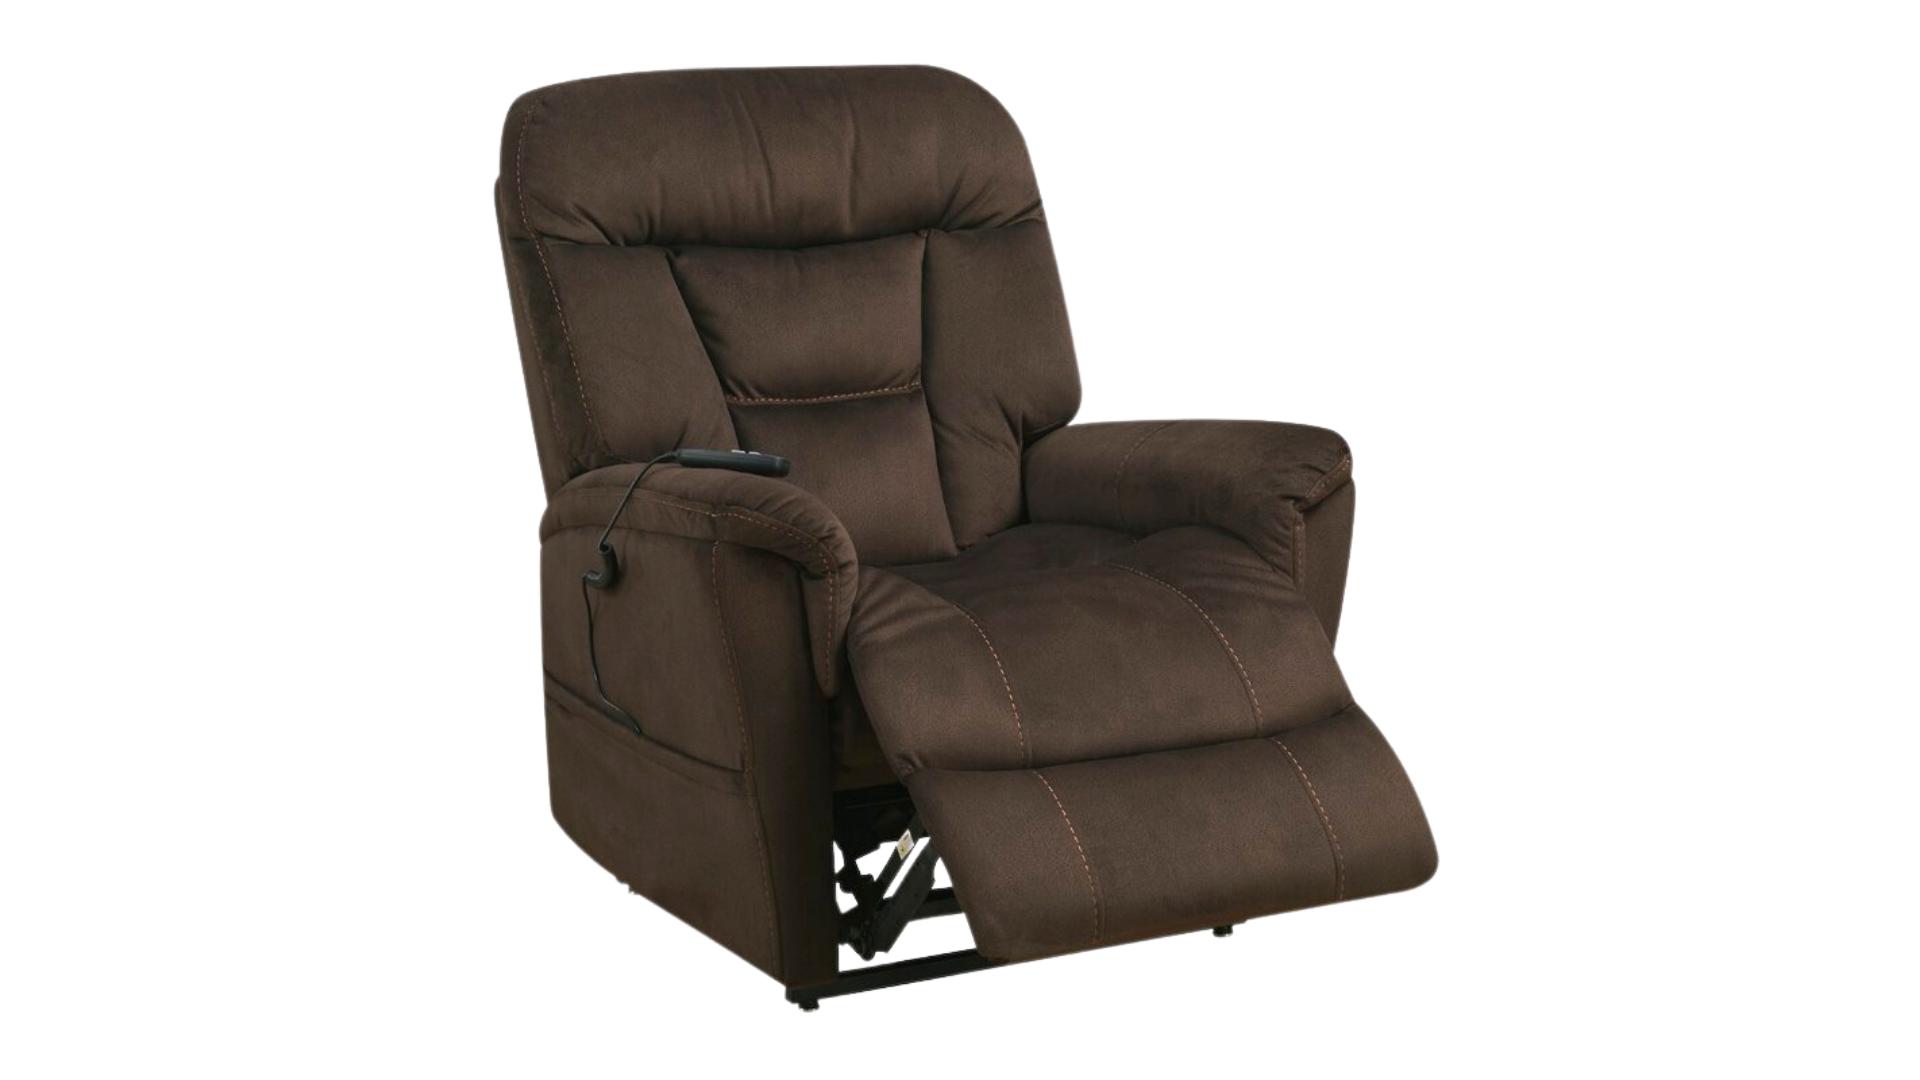 Fitzmaurice best recliner for sleep